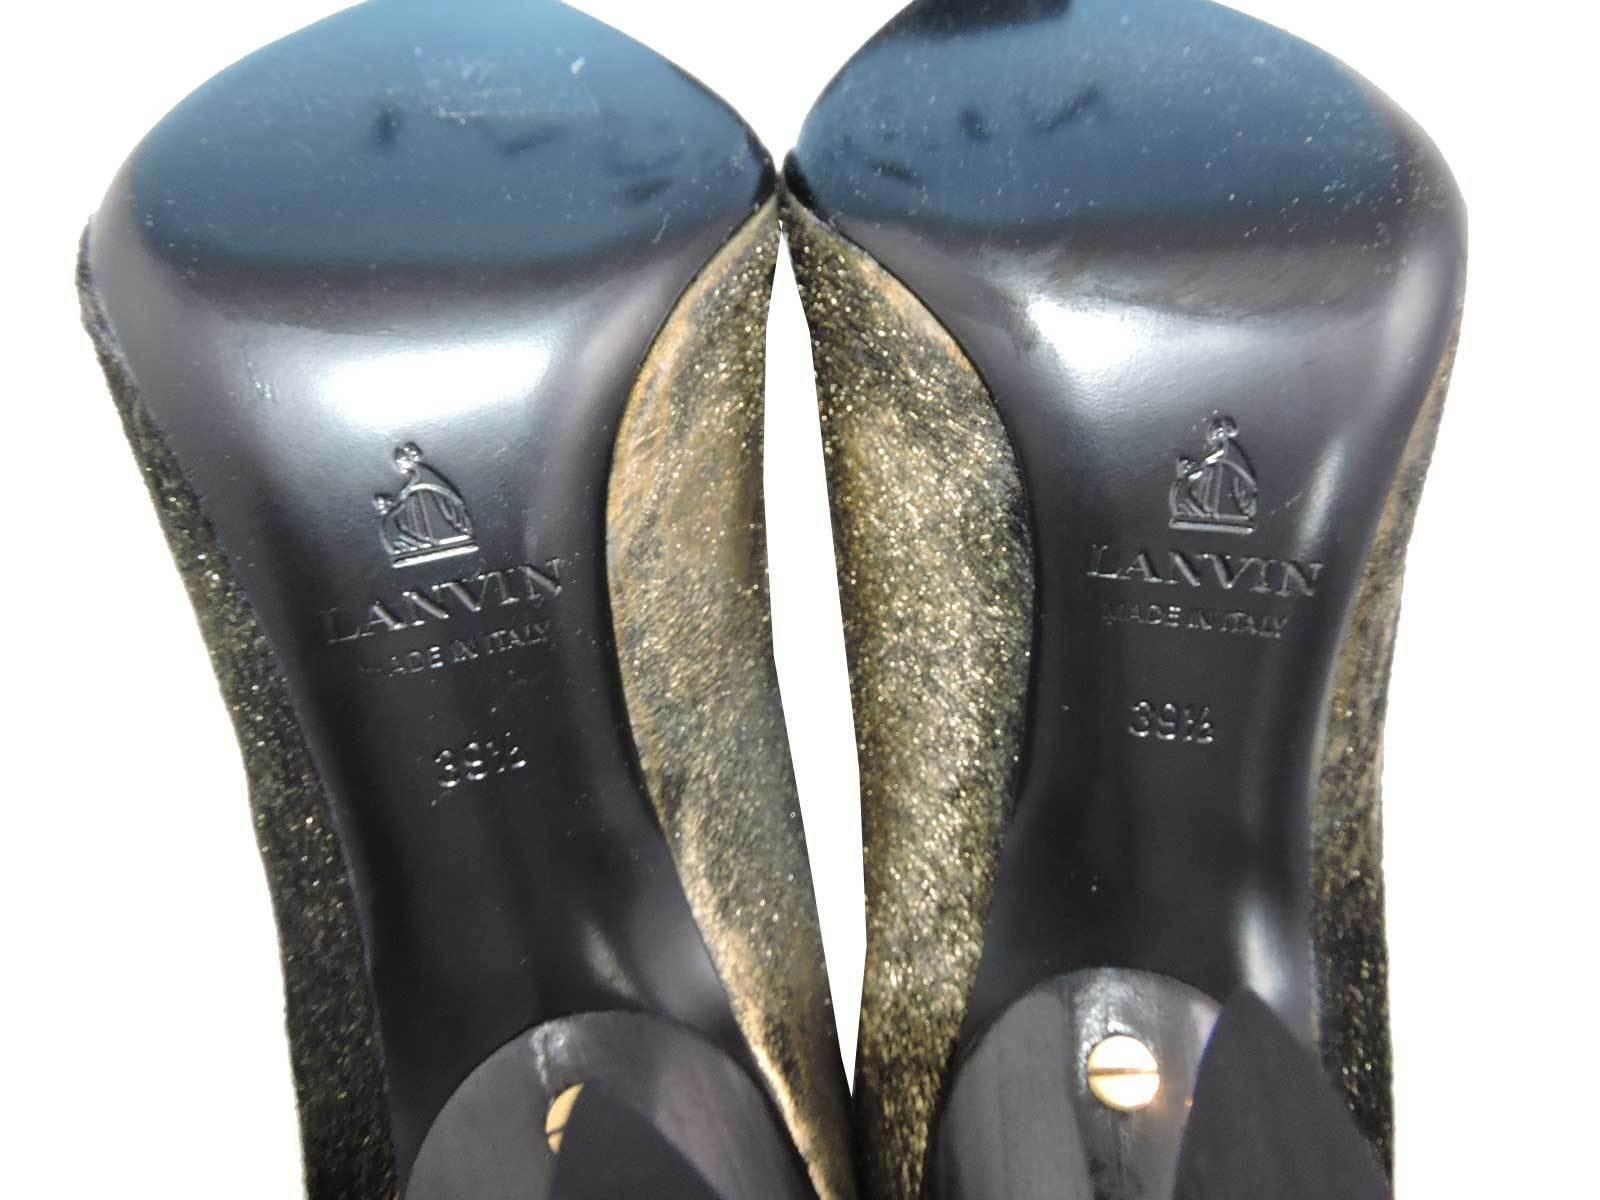 $980 Lanvin Classic Gold Metallic Brushed Calf Hair Pumps Heels Shoes 39.5